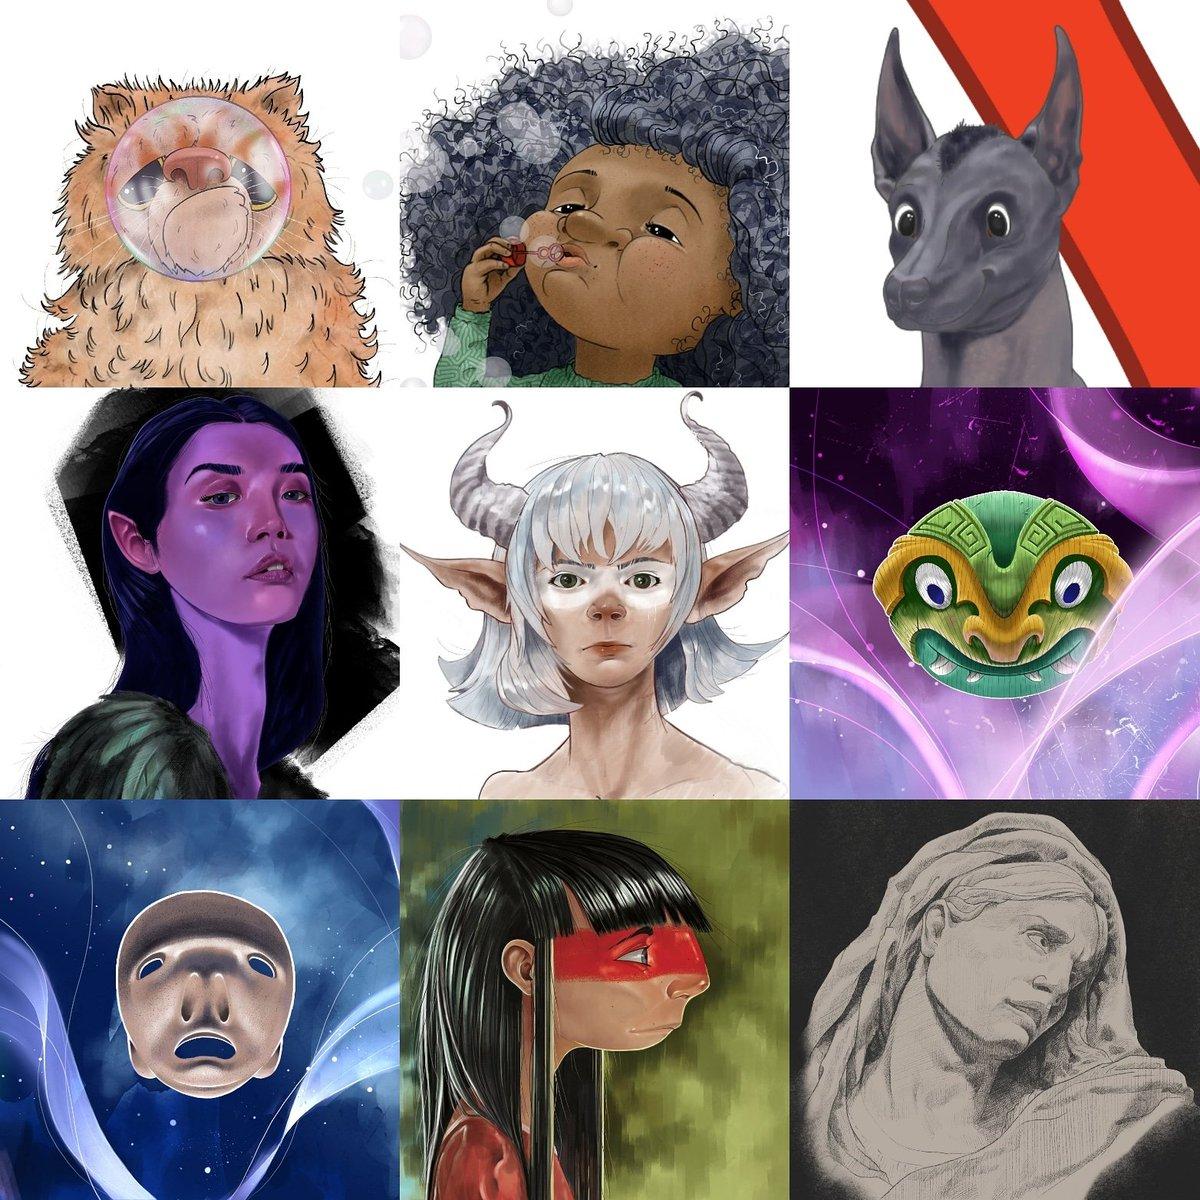 Nine Faces  #faceyourart #illustration #illustrationartists #illustrator #digitalartwork #digitaldrawing #digitalart #digitalartist #painting #characterdesign #character #childrensbookillustration #childrensillustration #childrensbooks #instaartist #instartpic.twitter.com/DERVdWxAO0